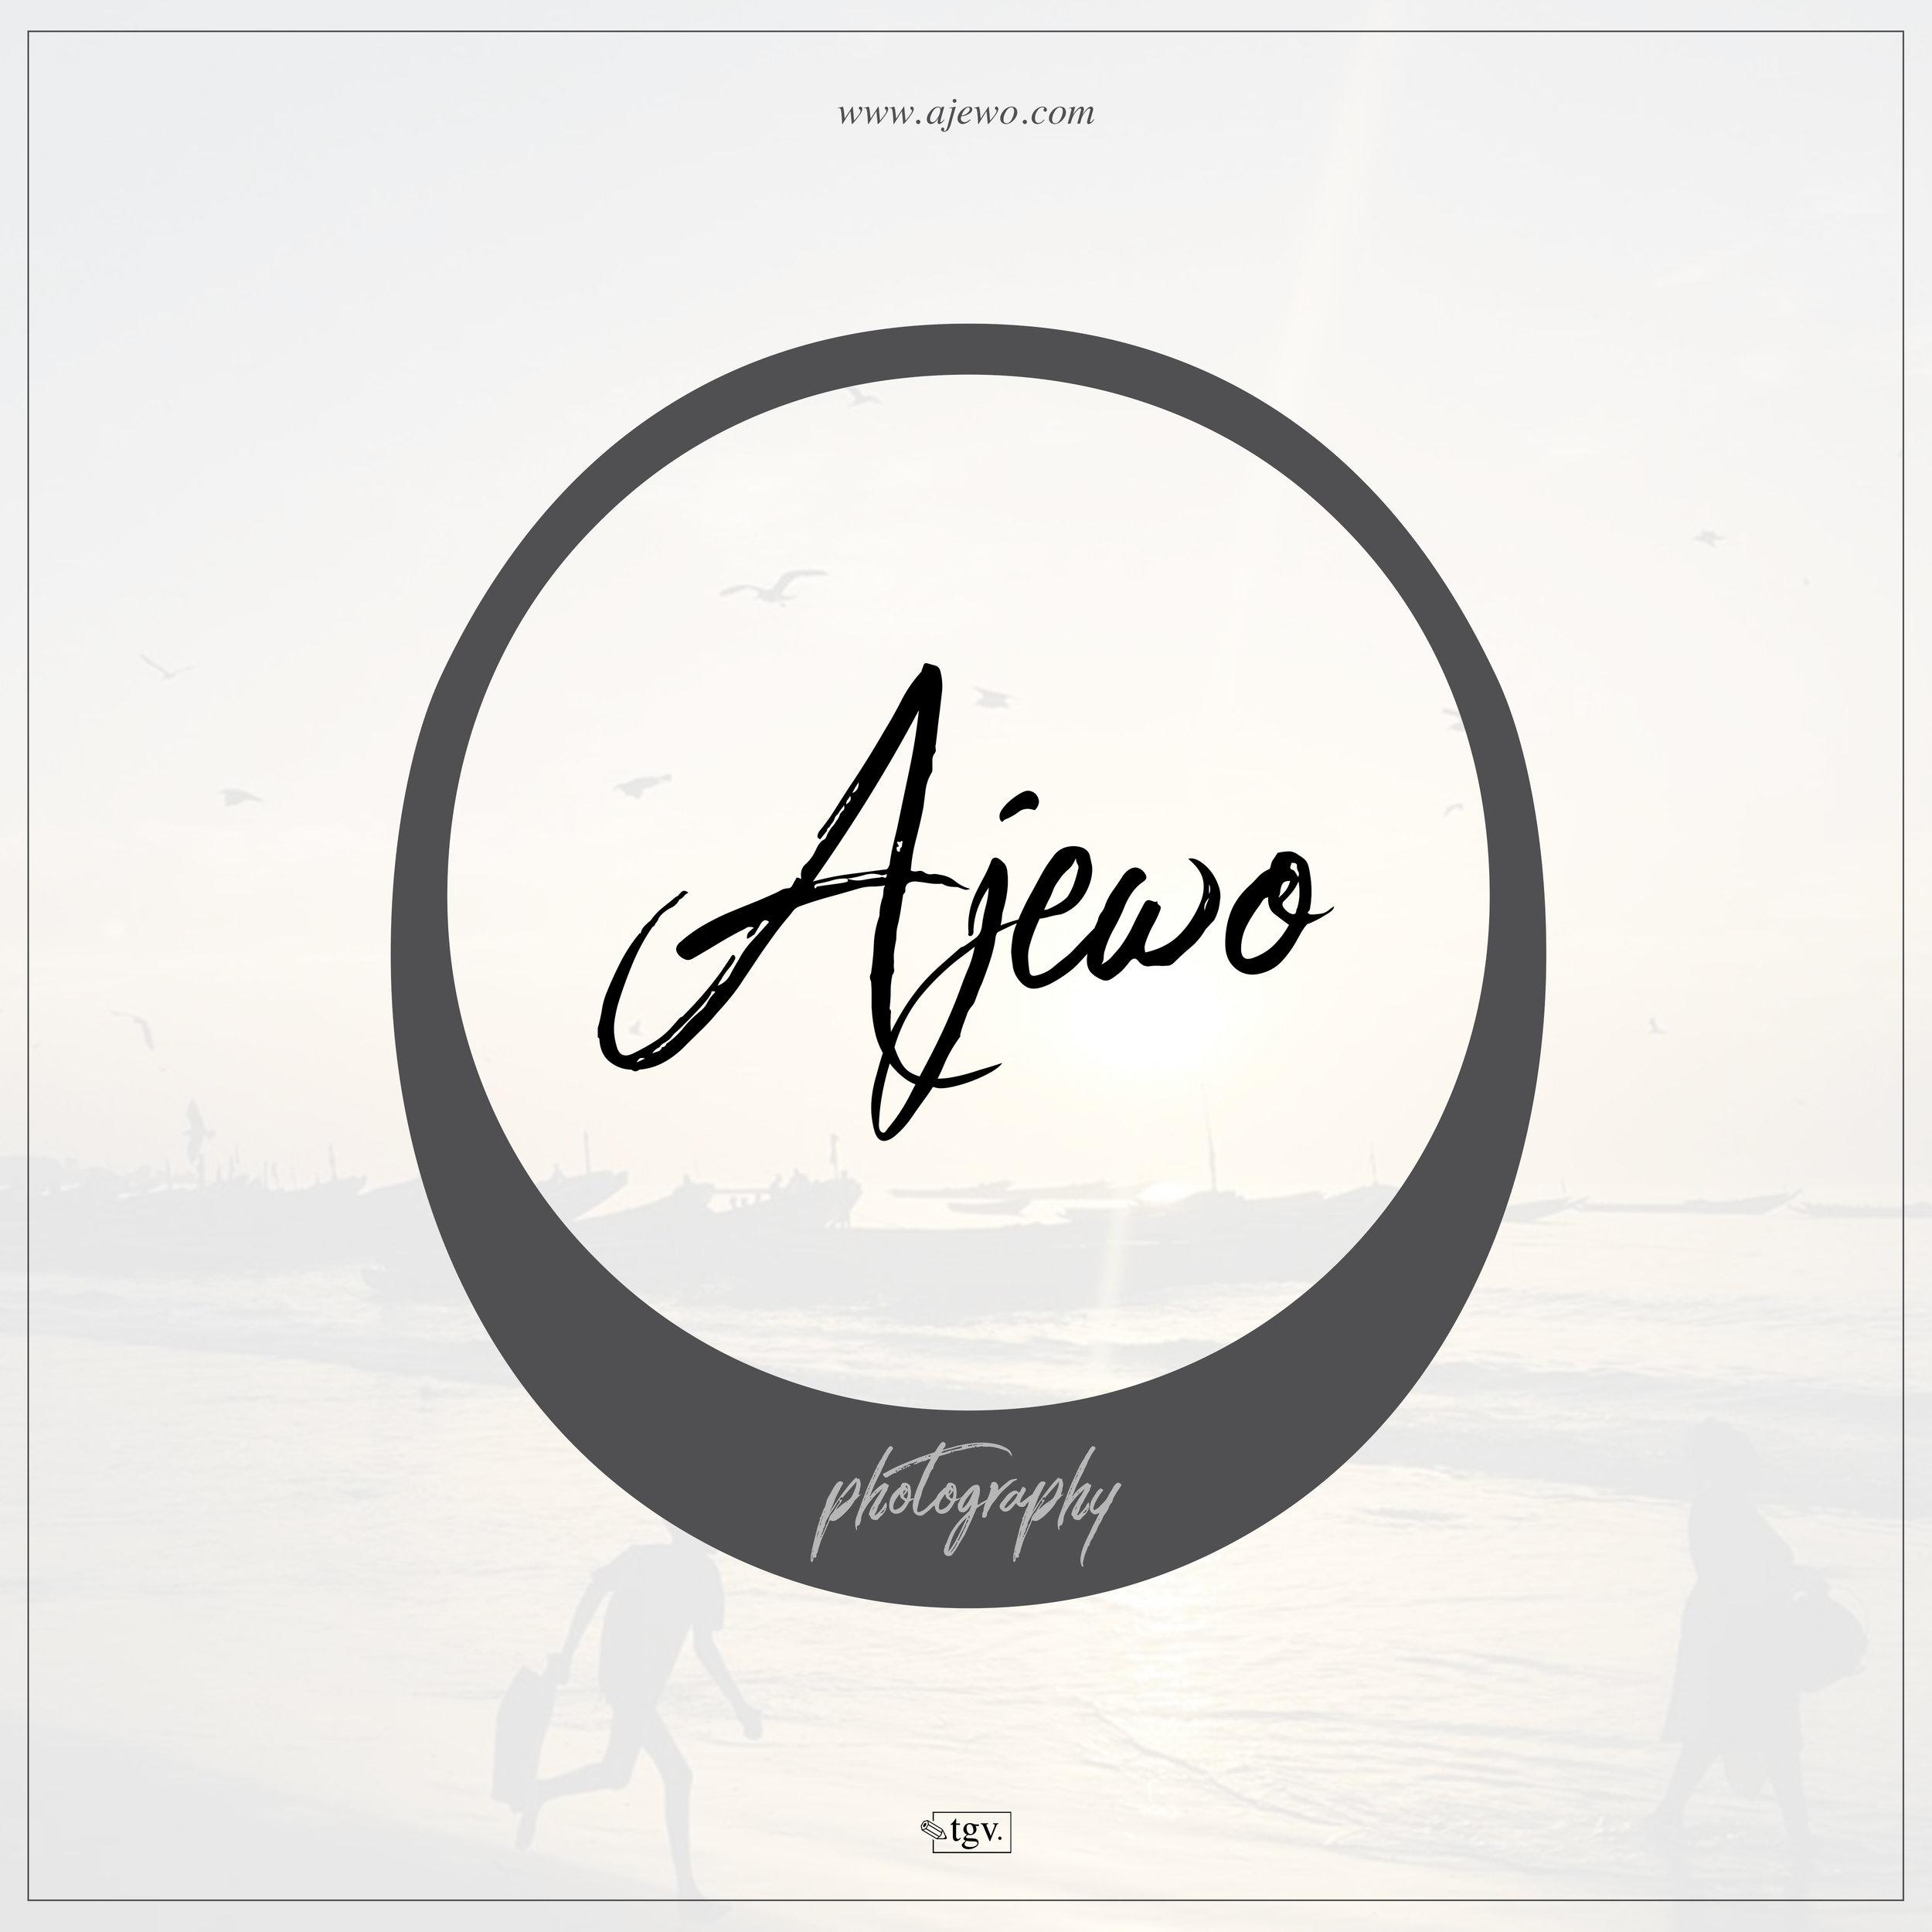 ajewo-logo-pic.jpg